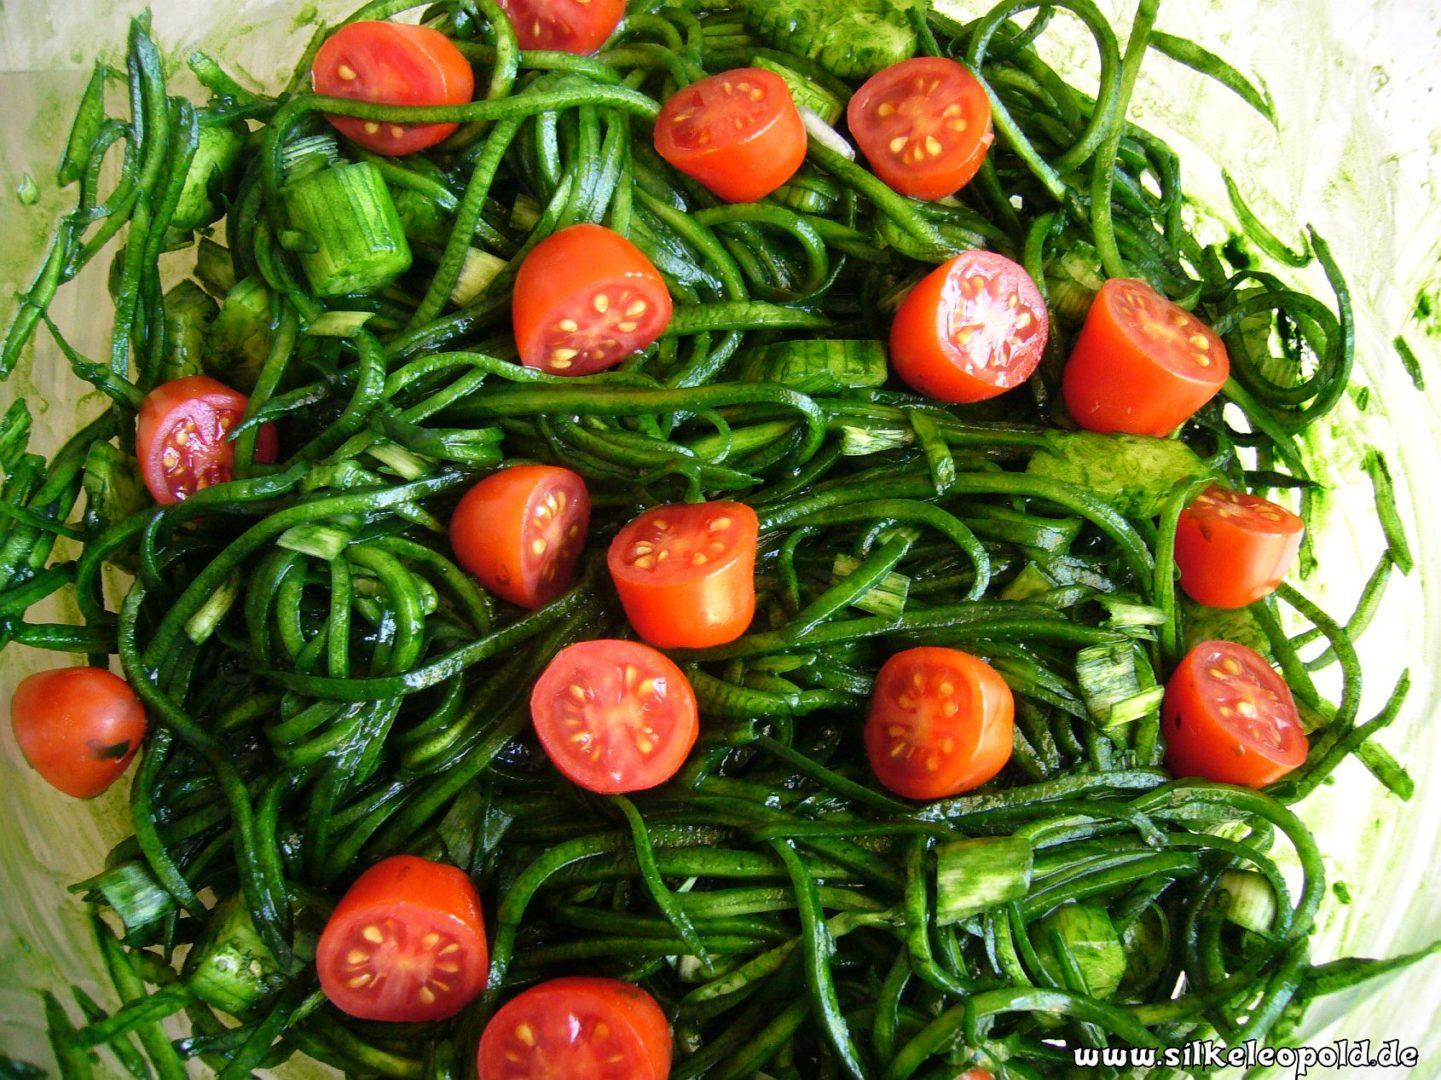 Chlorellaspaghetti